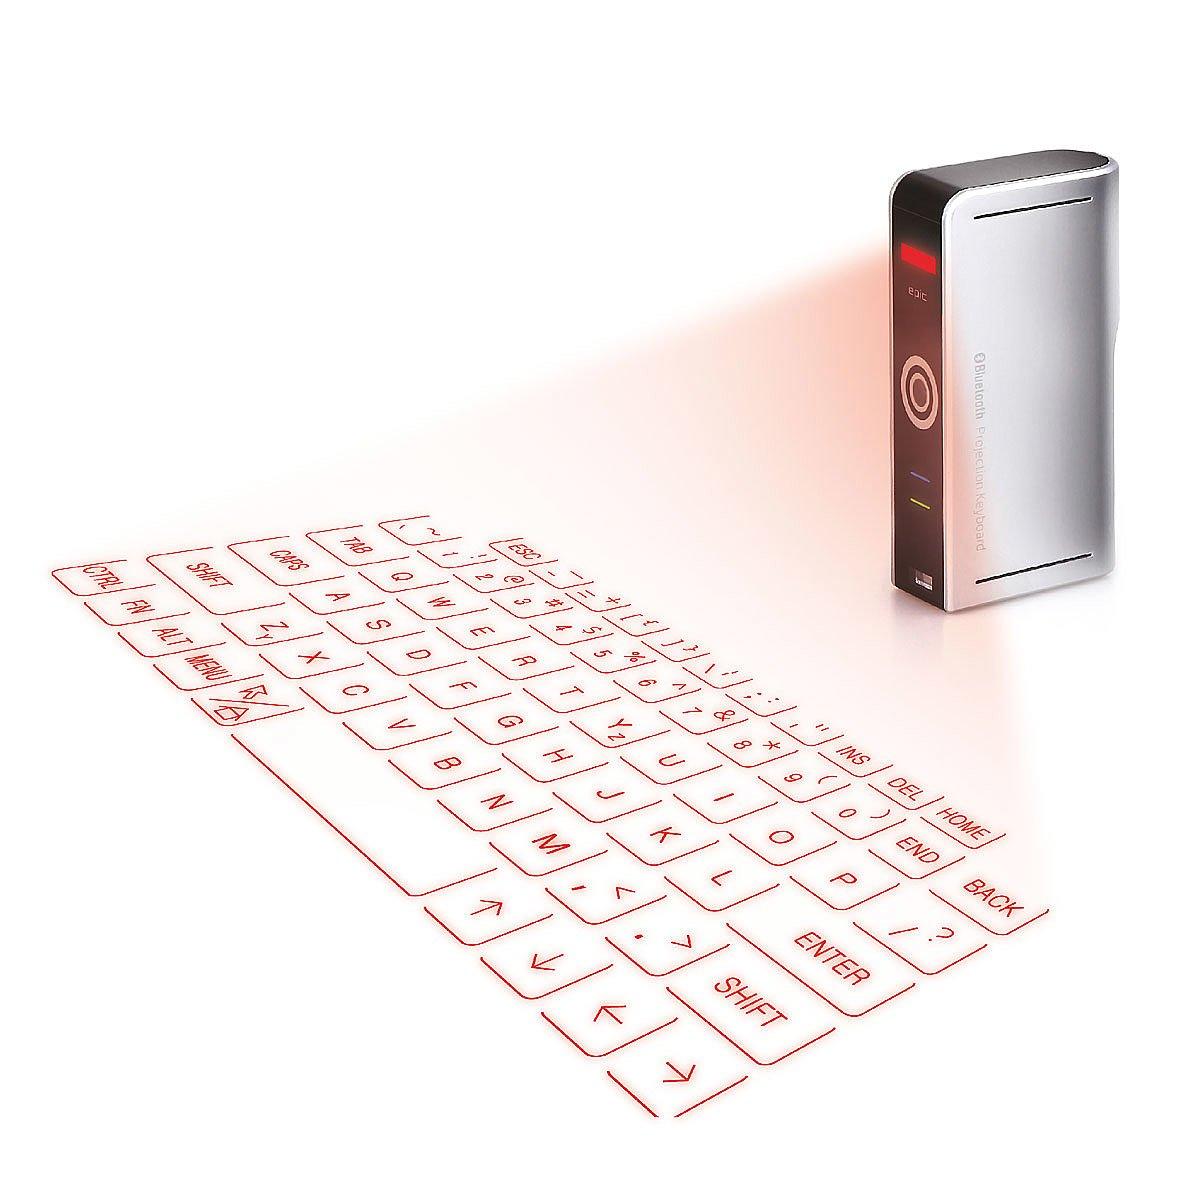 Laser Projection Keyboard | Bluetooth, iPad, tablet, Celluon, virtual keyboard